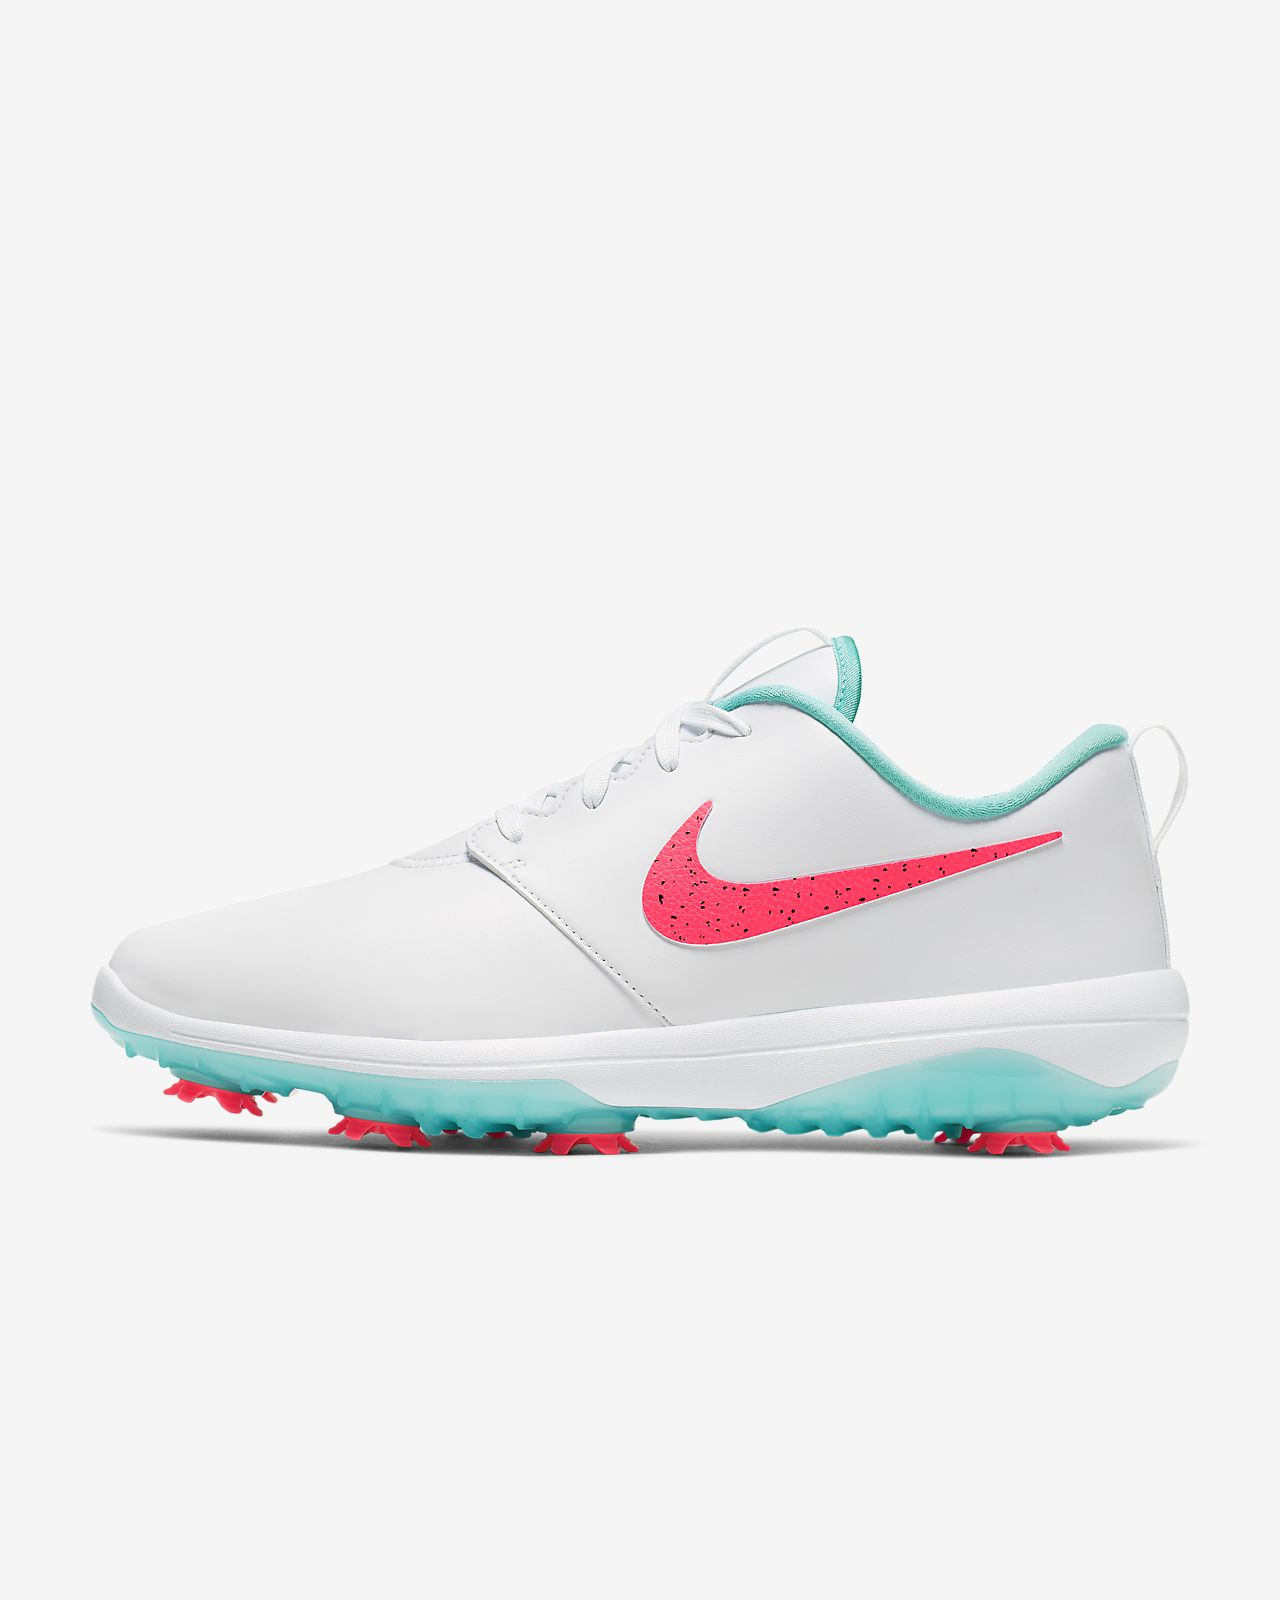 Nike Roshe G Tour (W)男子高尔夫球鞋(宽版)